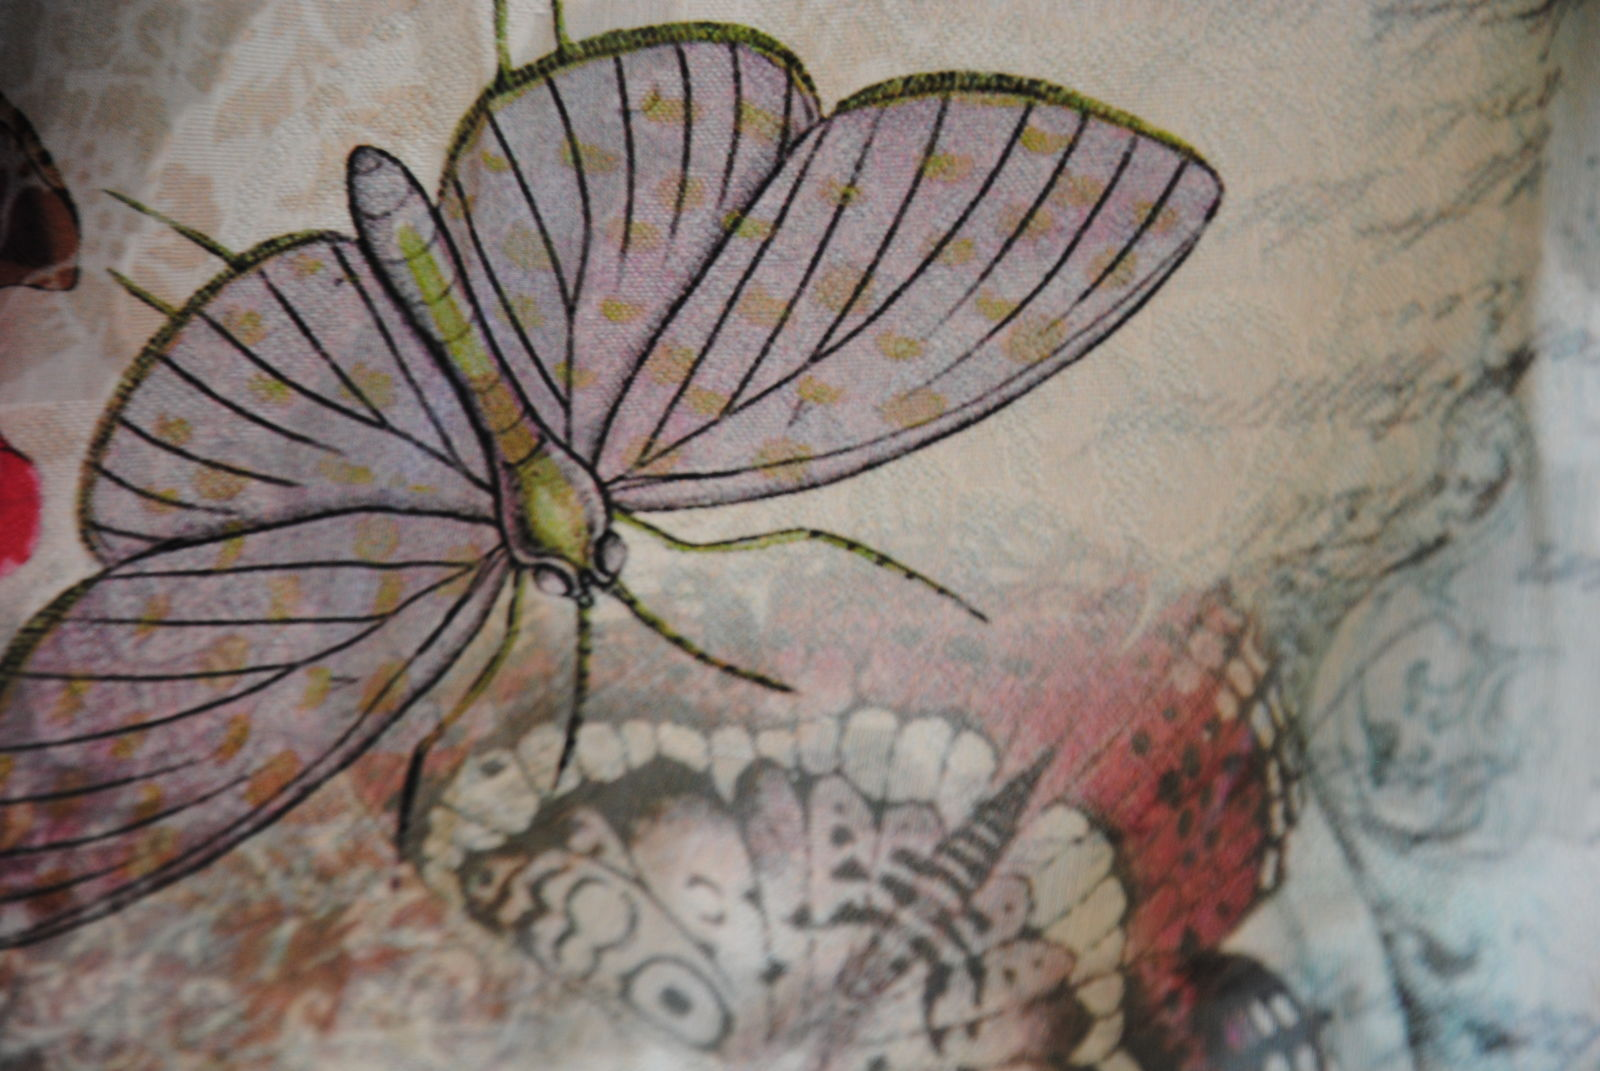 DSC 0812 farfalle & poesia   esaurito